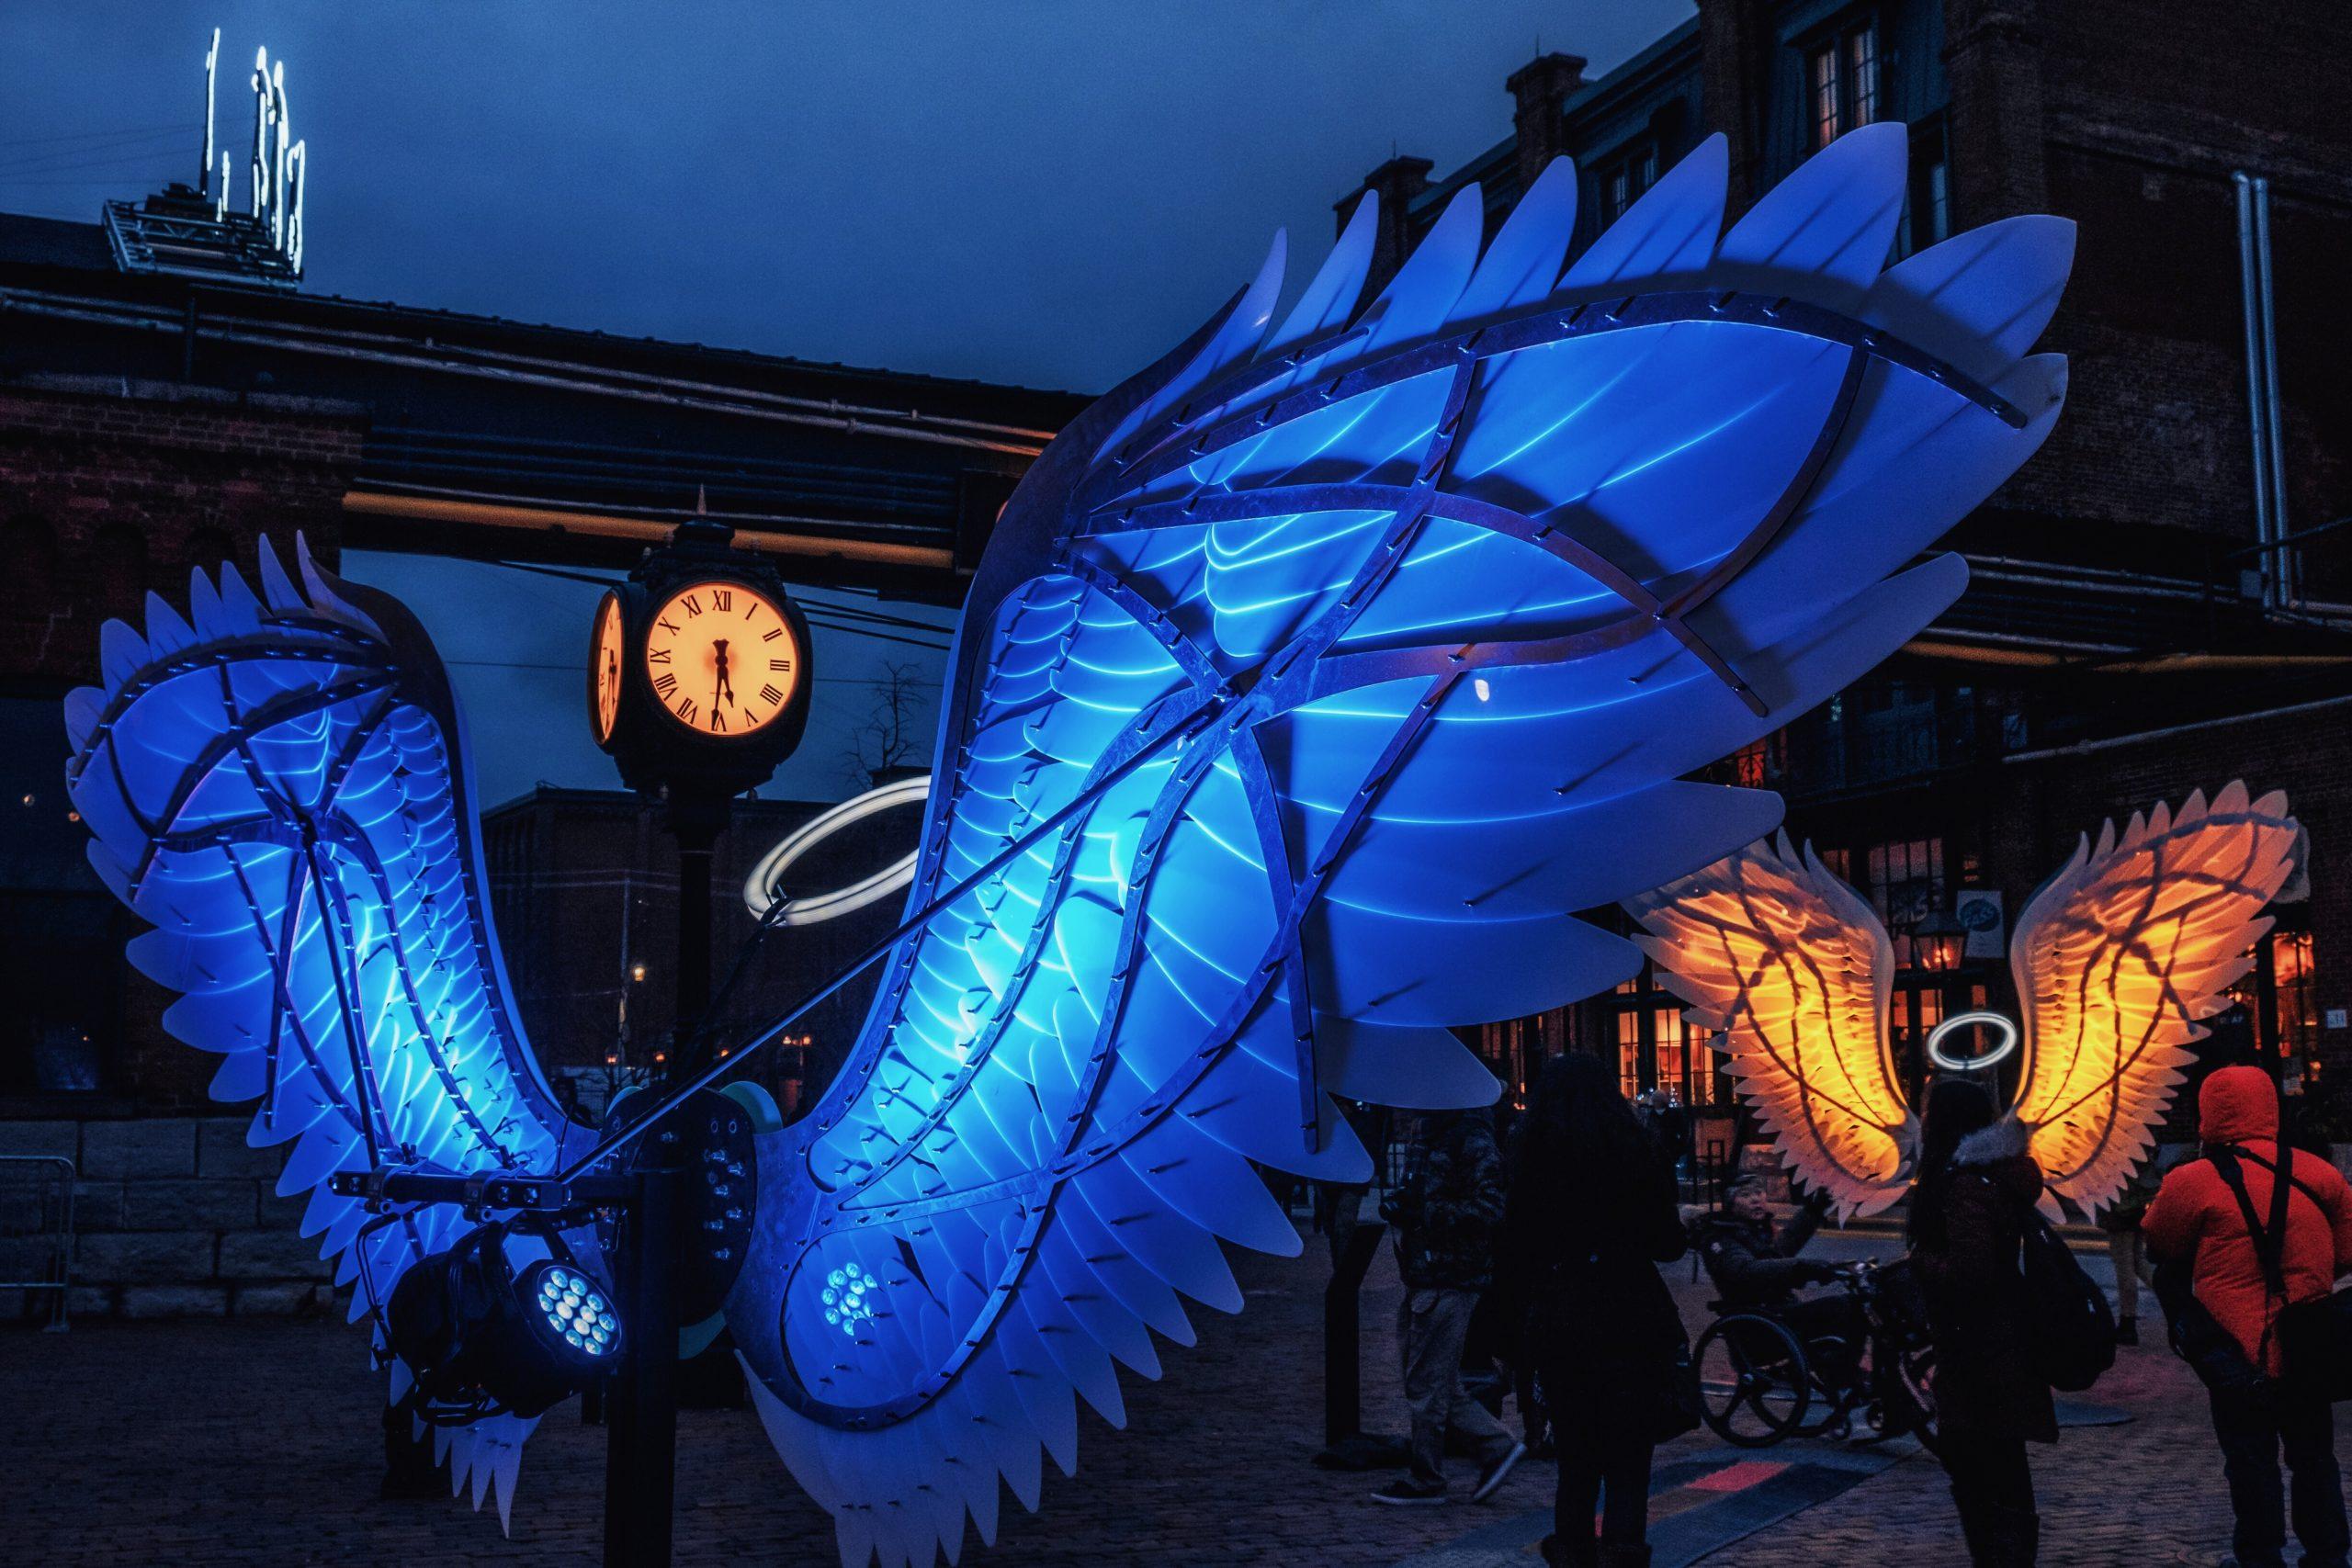 Hong Kong International Light Arts Display 2018